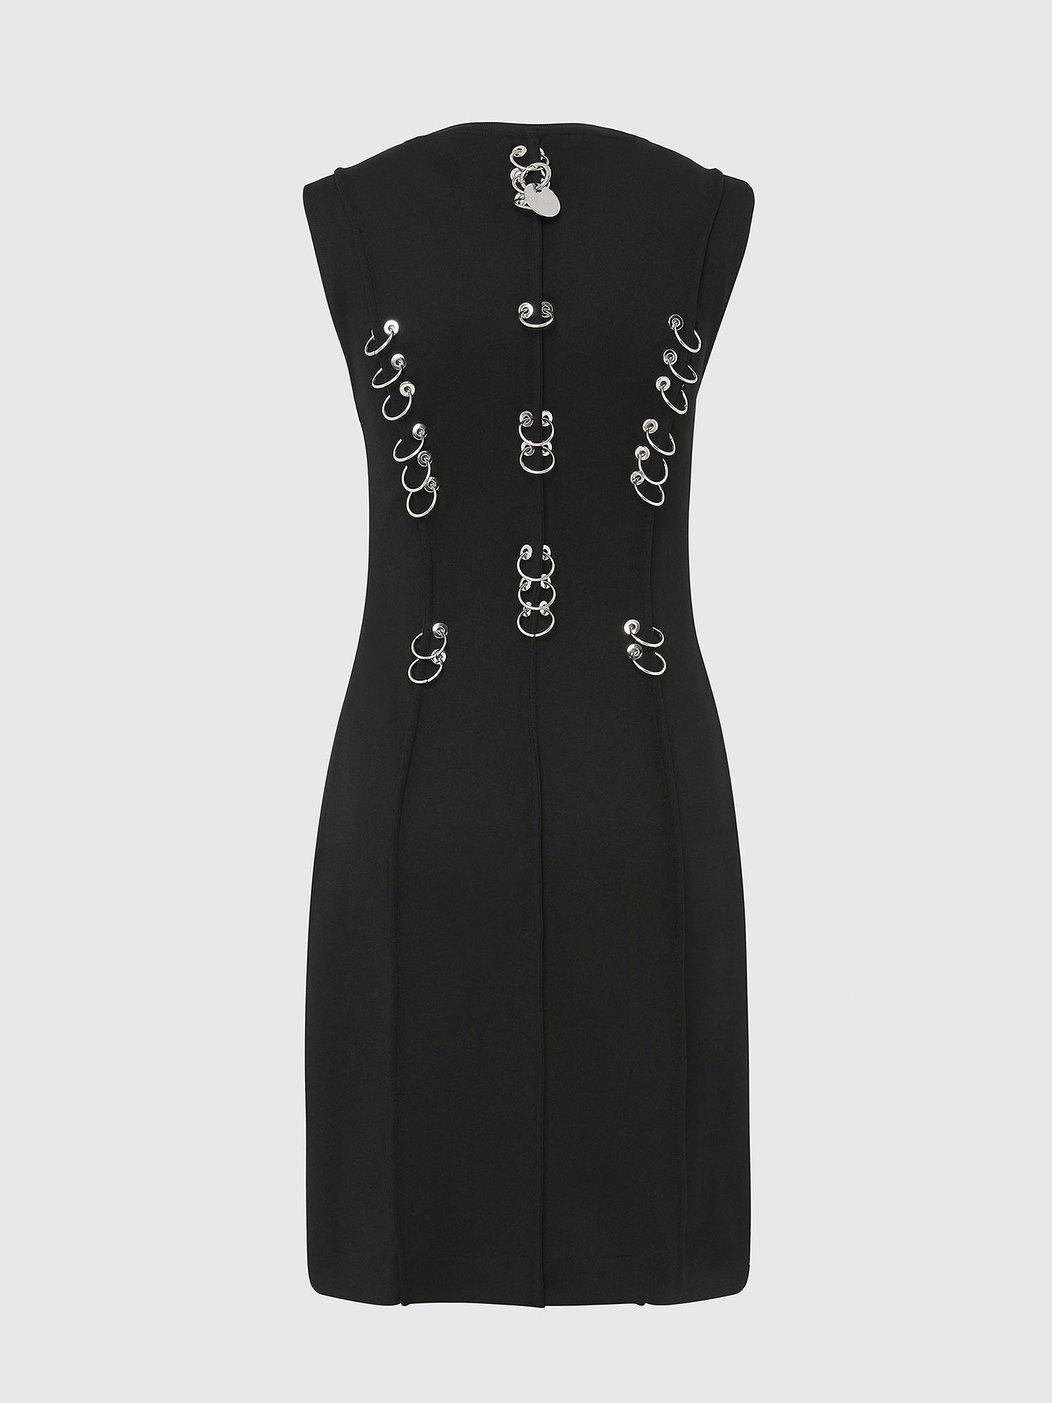 Stretch Knit Mini Milano Dress